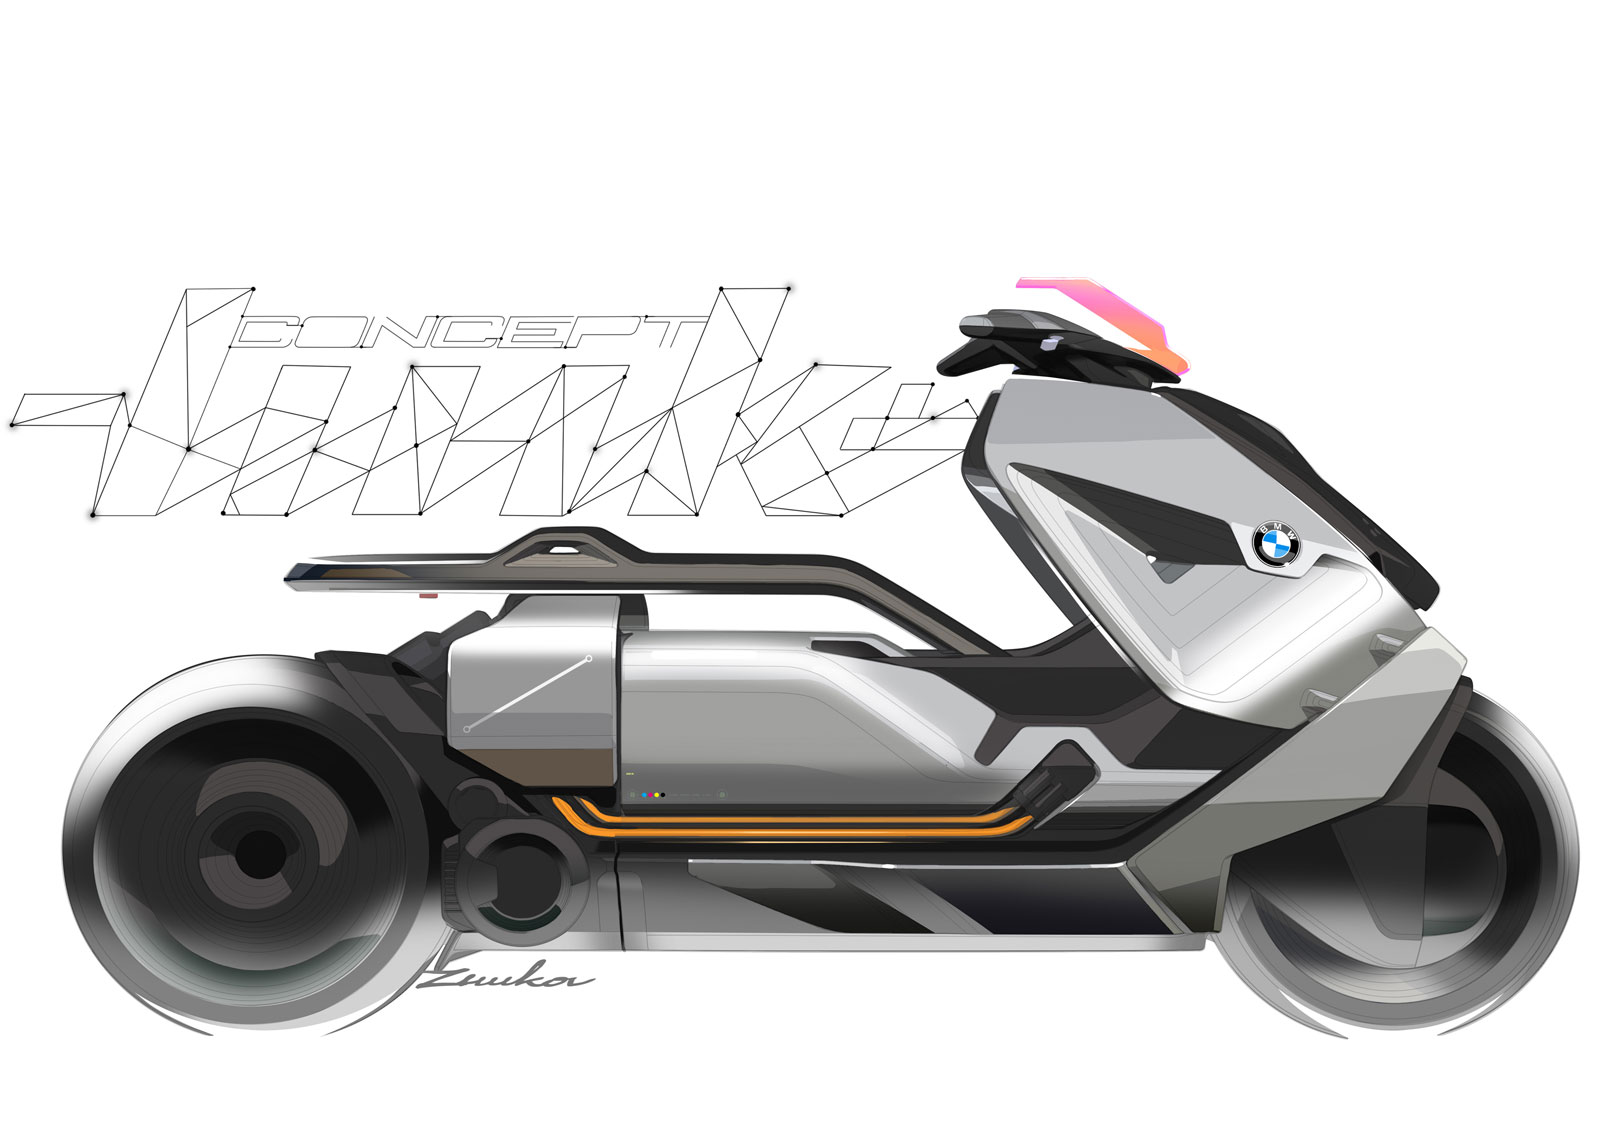 Bmw Motorrad Concept Link Design Sketch Car Body Design